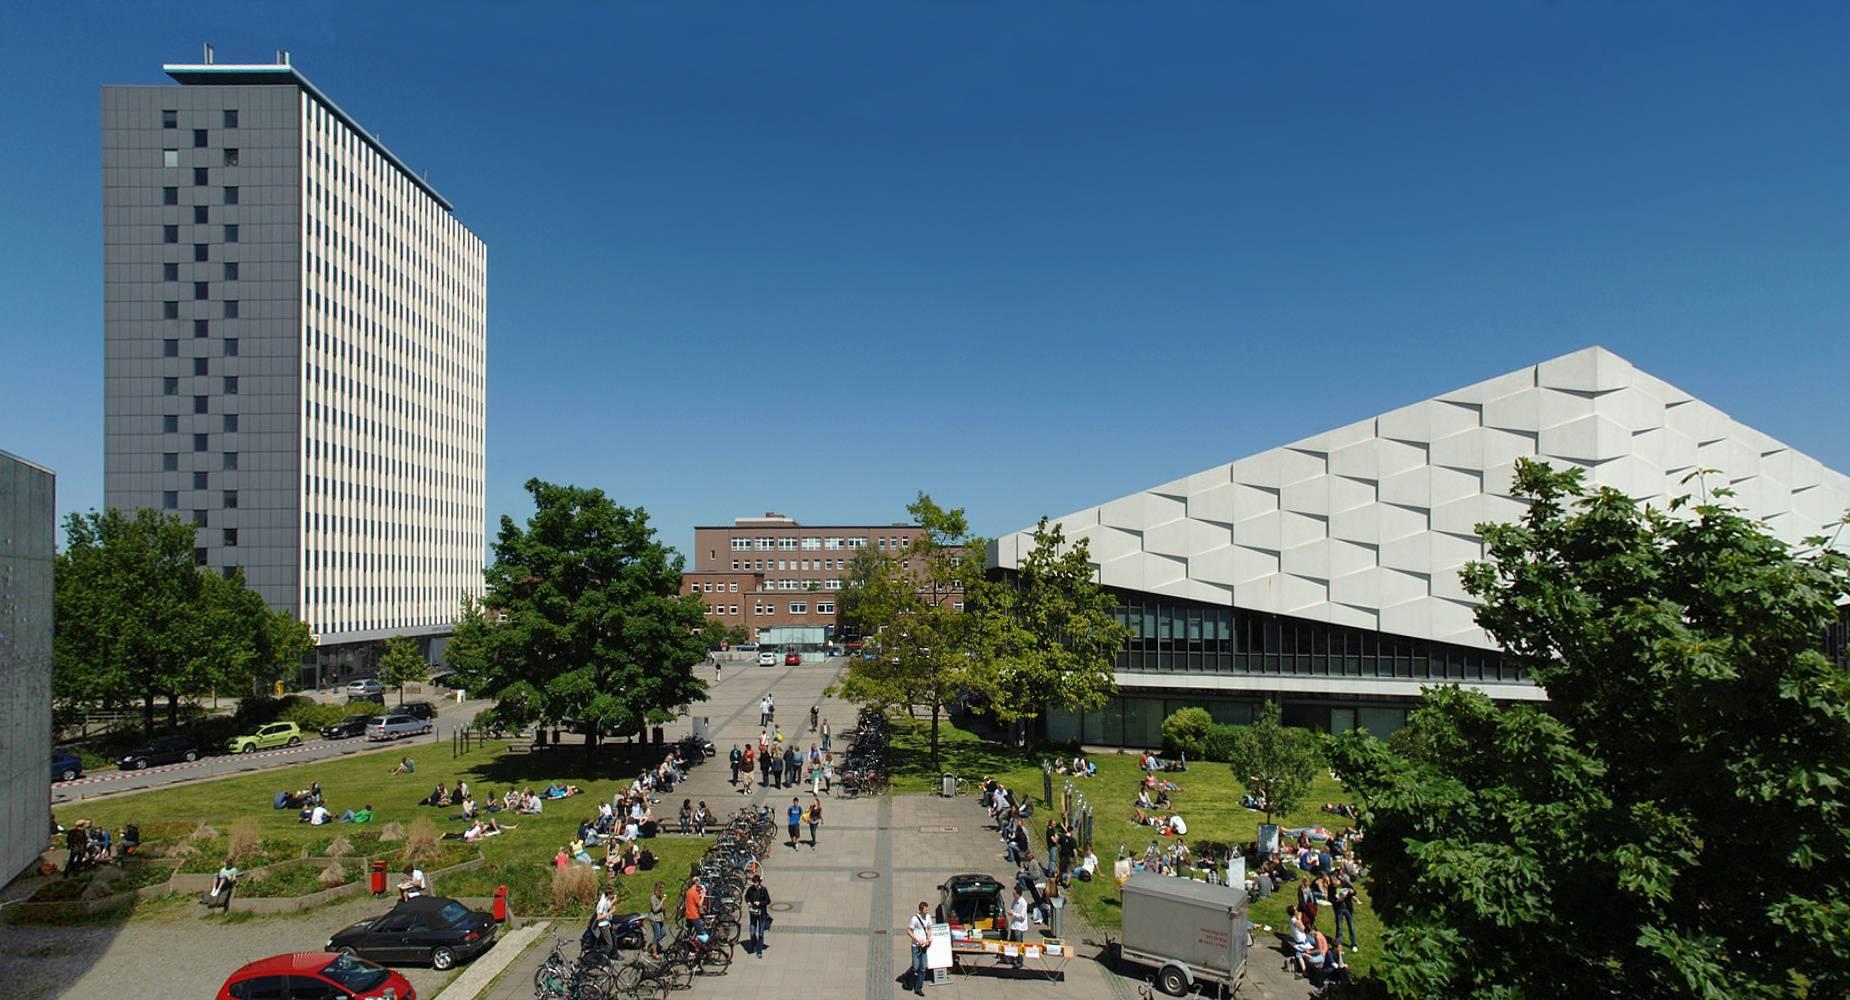 Uni Kiel Medizin studieren